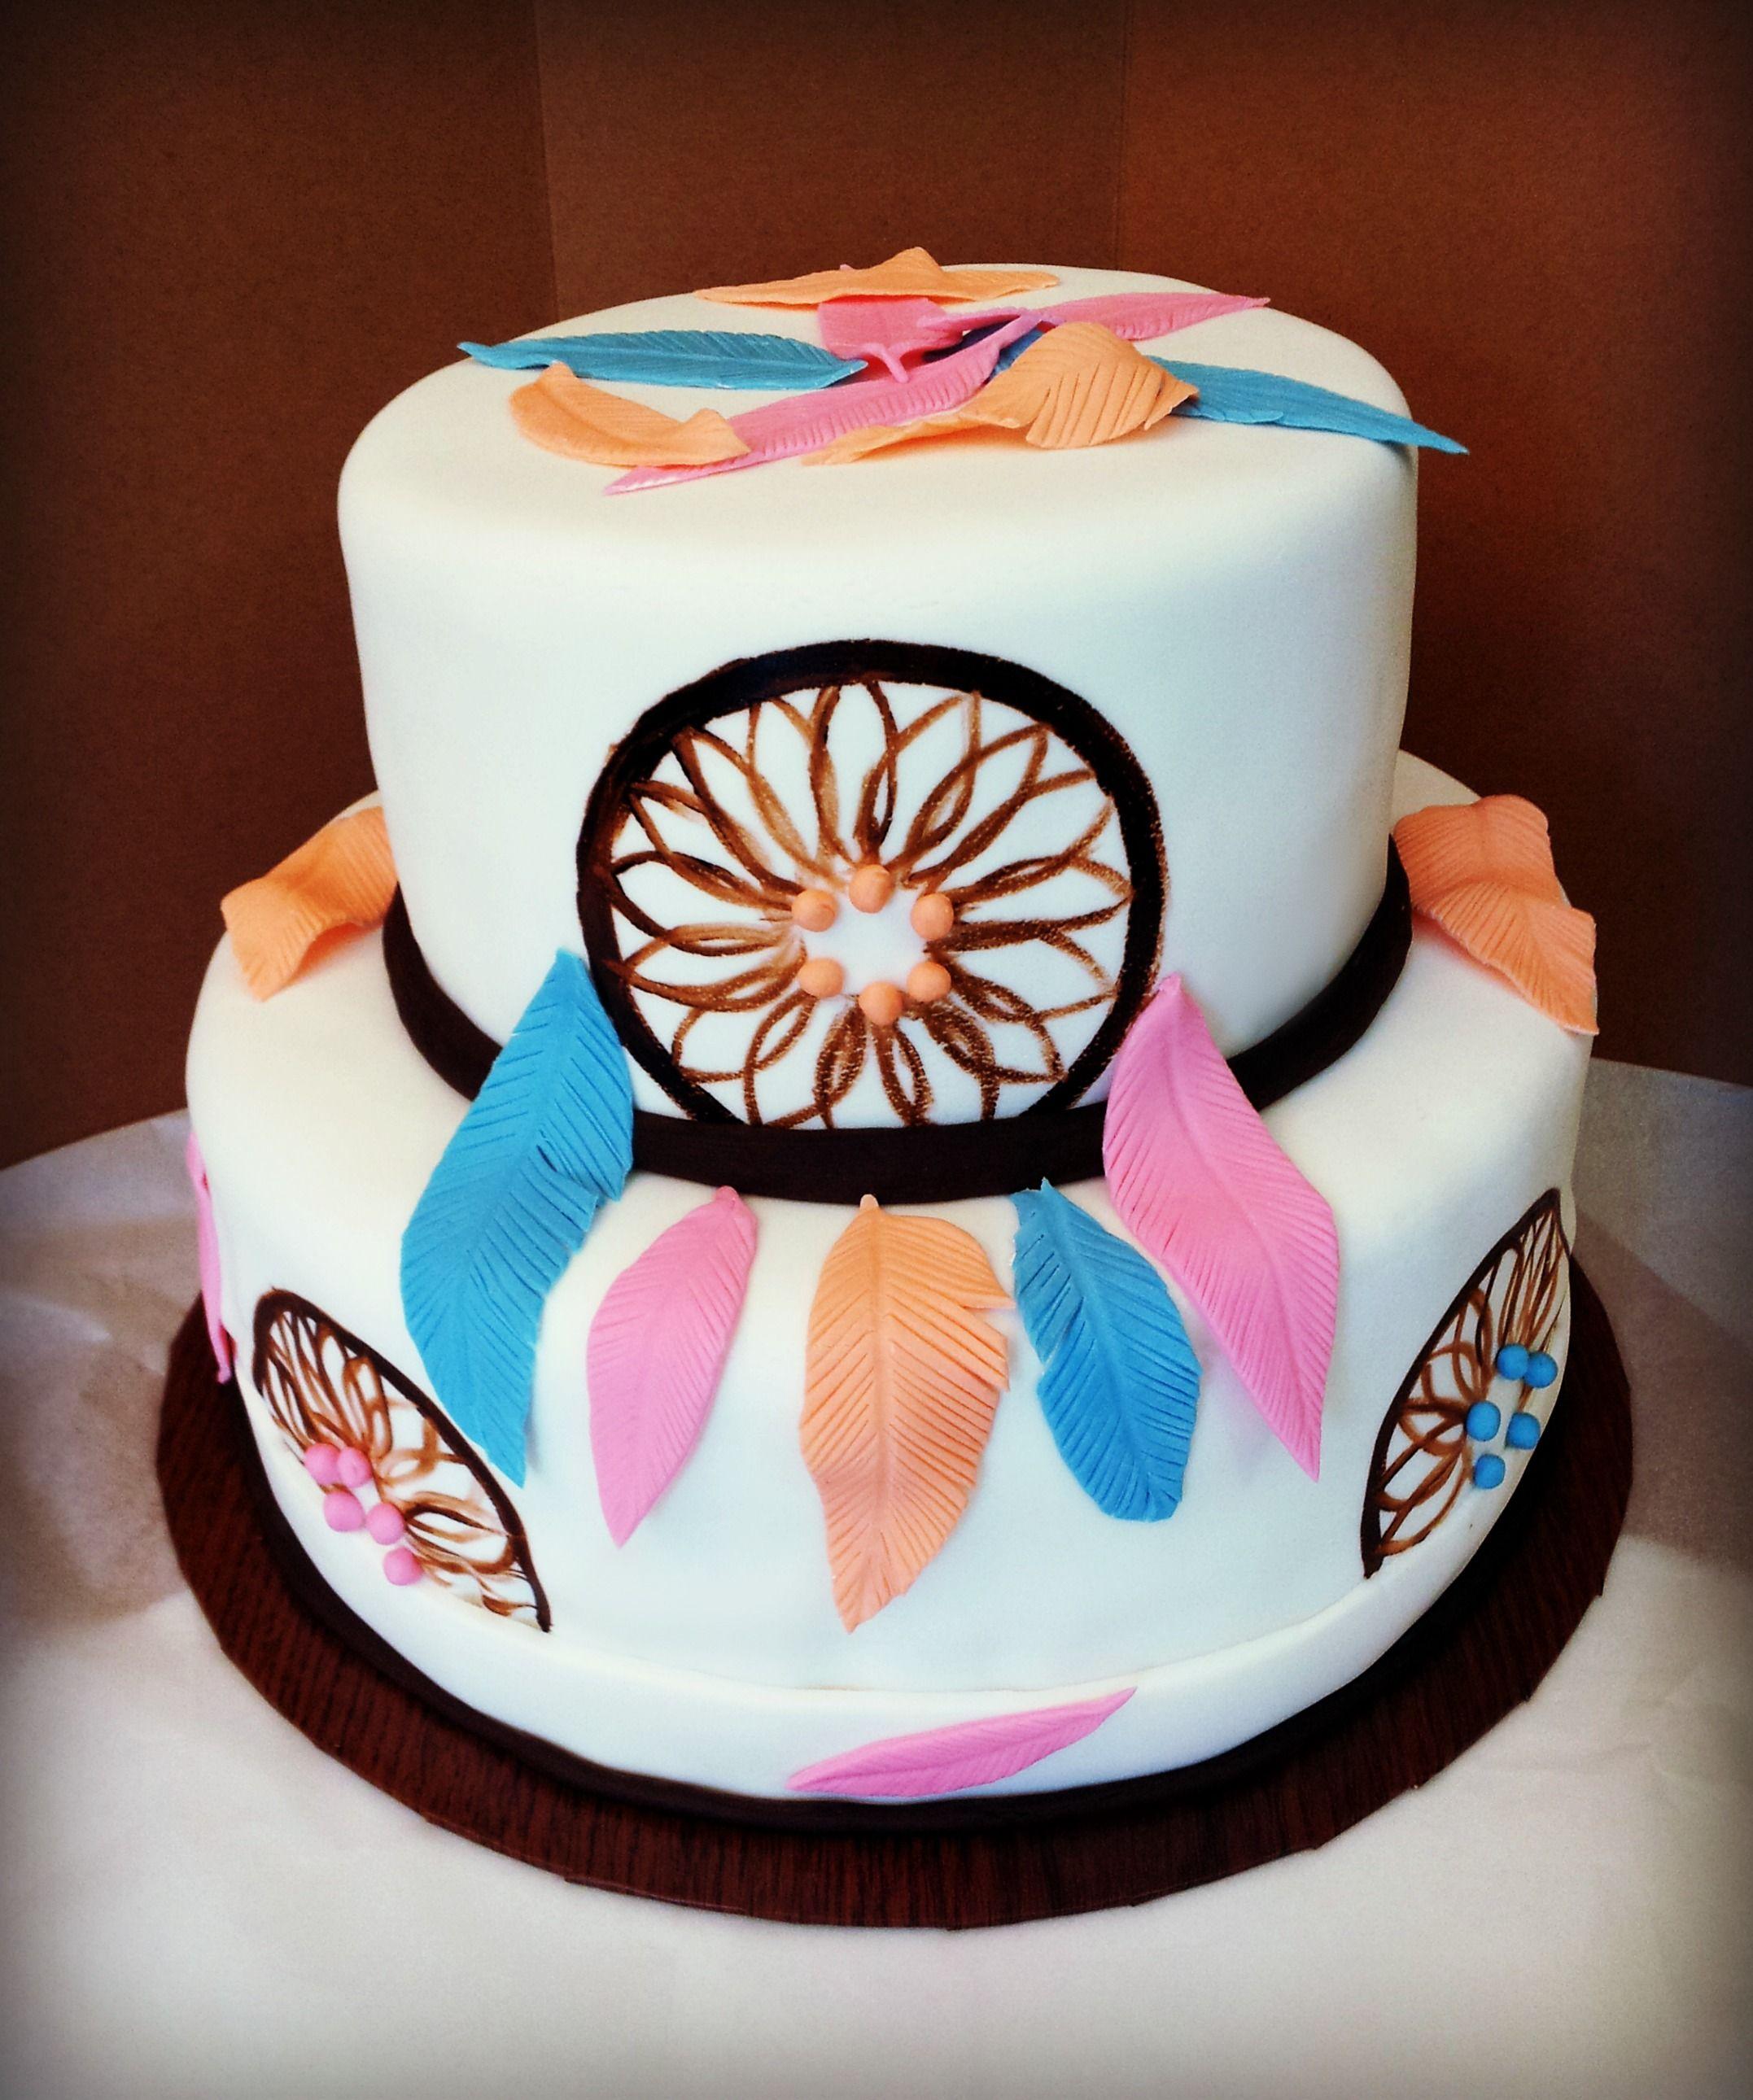 Native American Cake Themed Cakes Dream Catchers Birthday Ideas Birthdays Decorating Designer